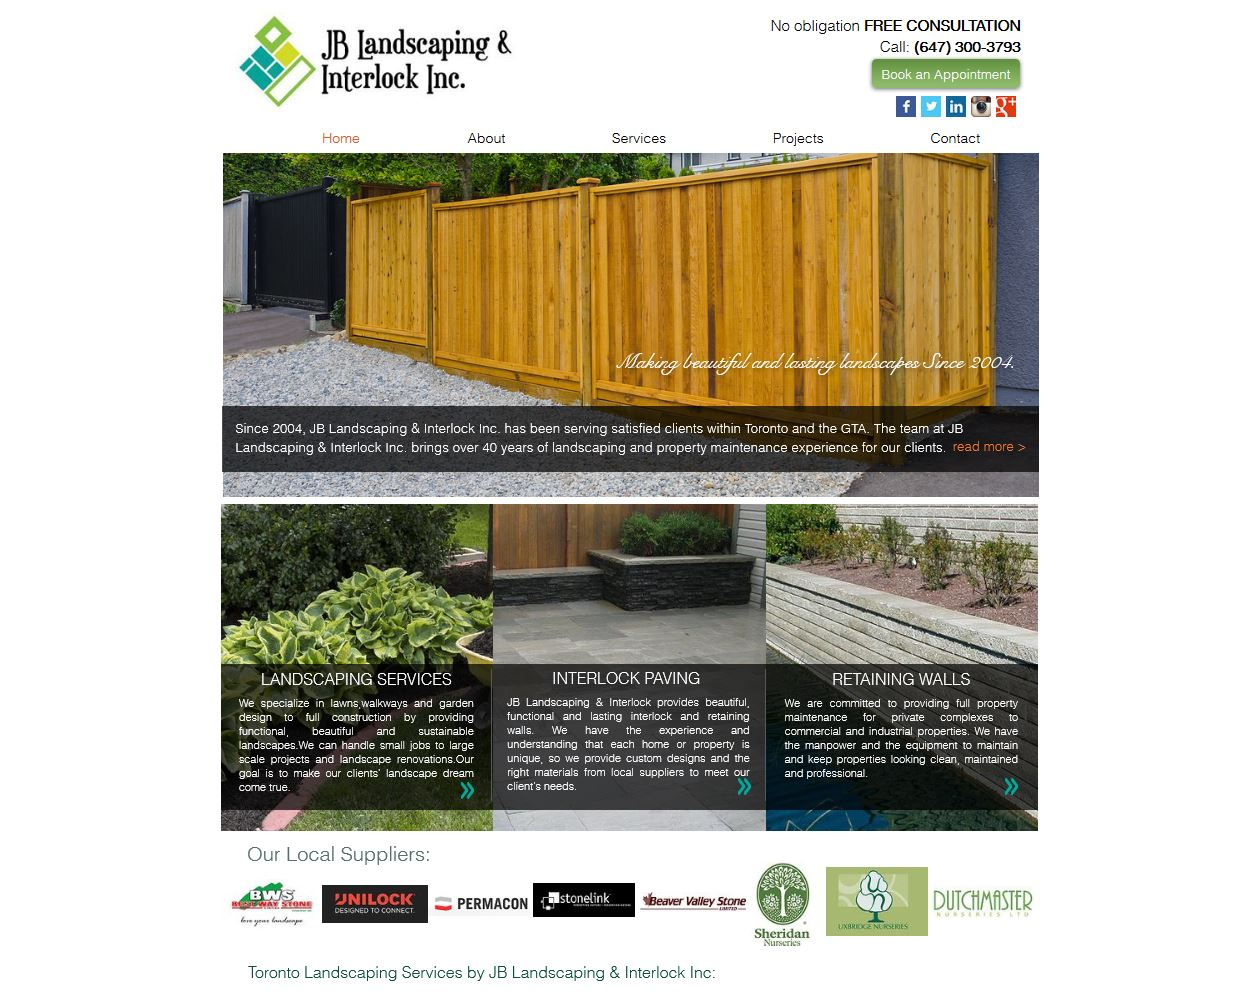 JB Landscaping and Interlock Inc.